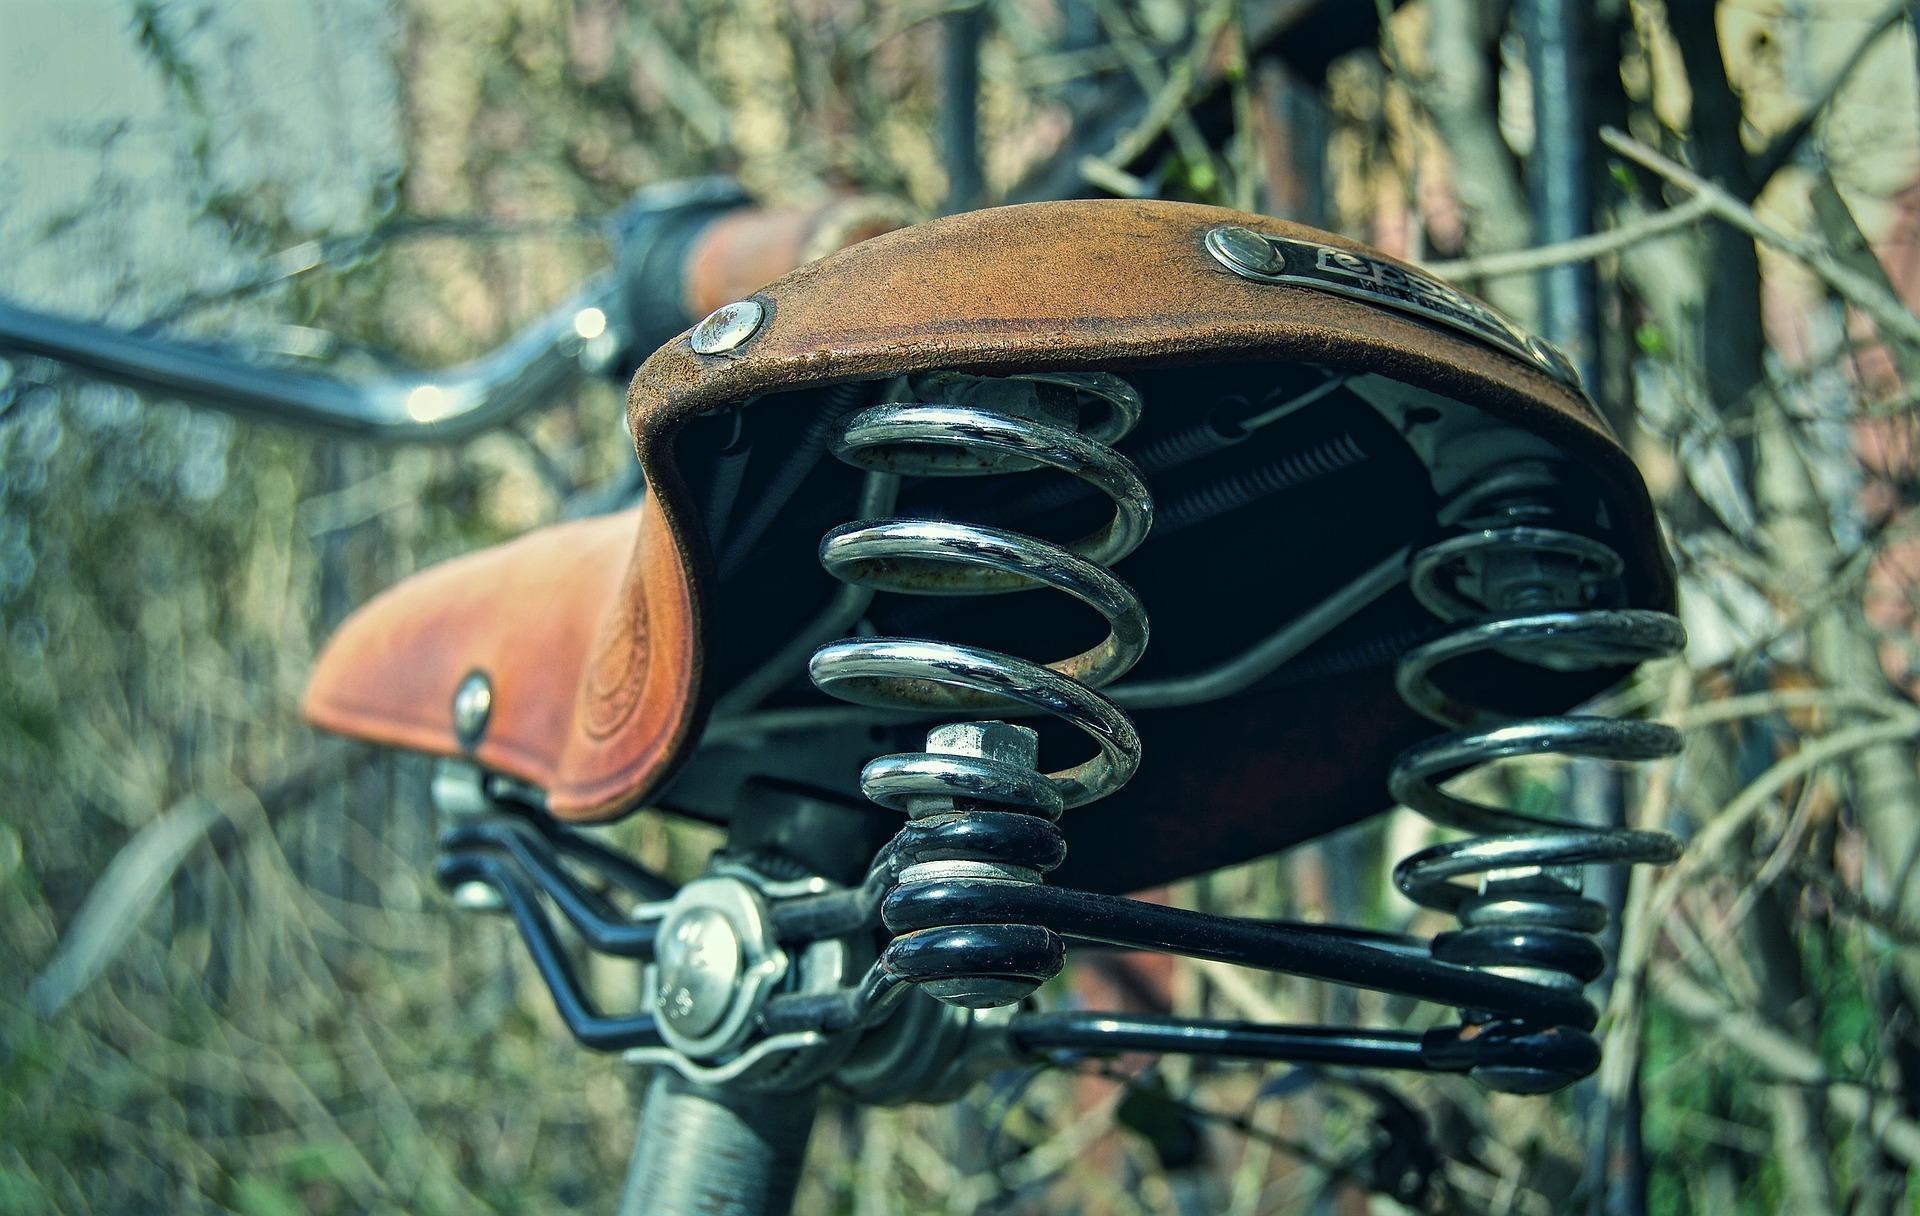 saddle-2614038_1920.jpg